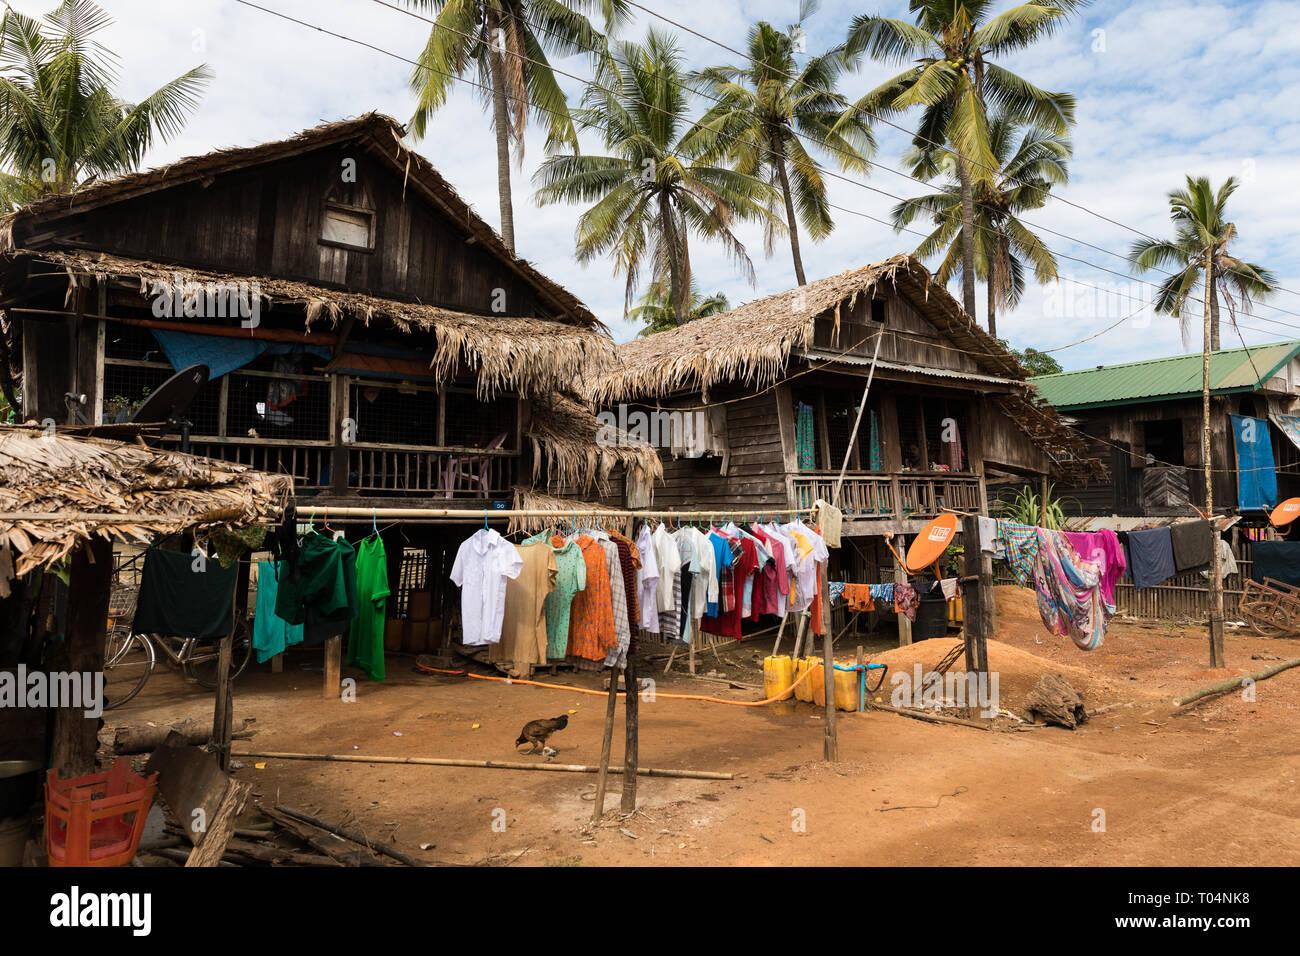 Rural village life in a small town in Myanmar (Burma Stock